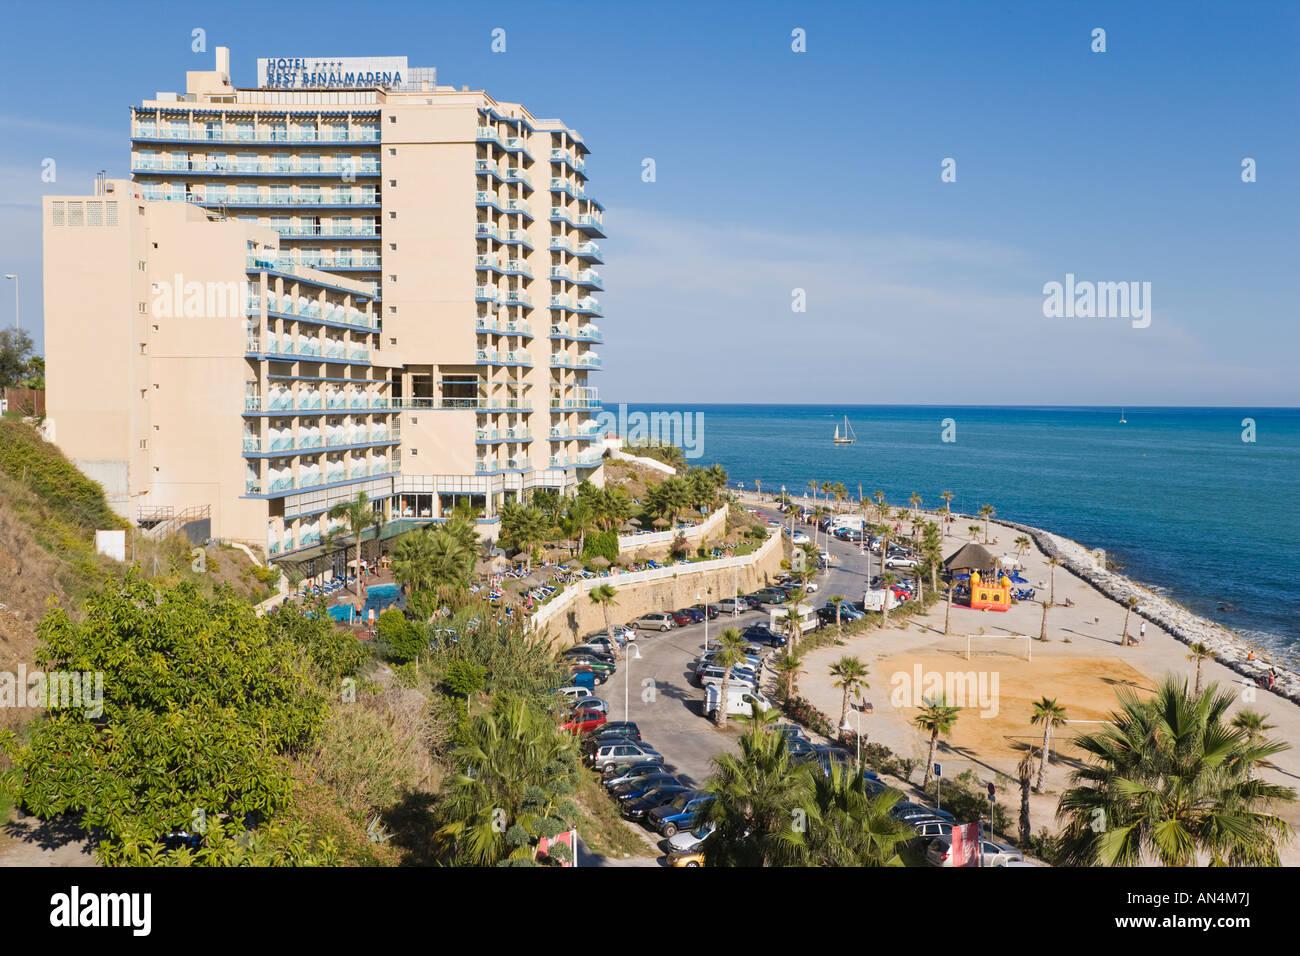 Benalmadena Costa Malaga Province Costa del Sol Spain Hotel Best